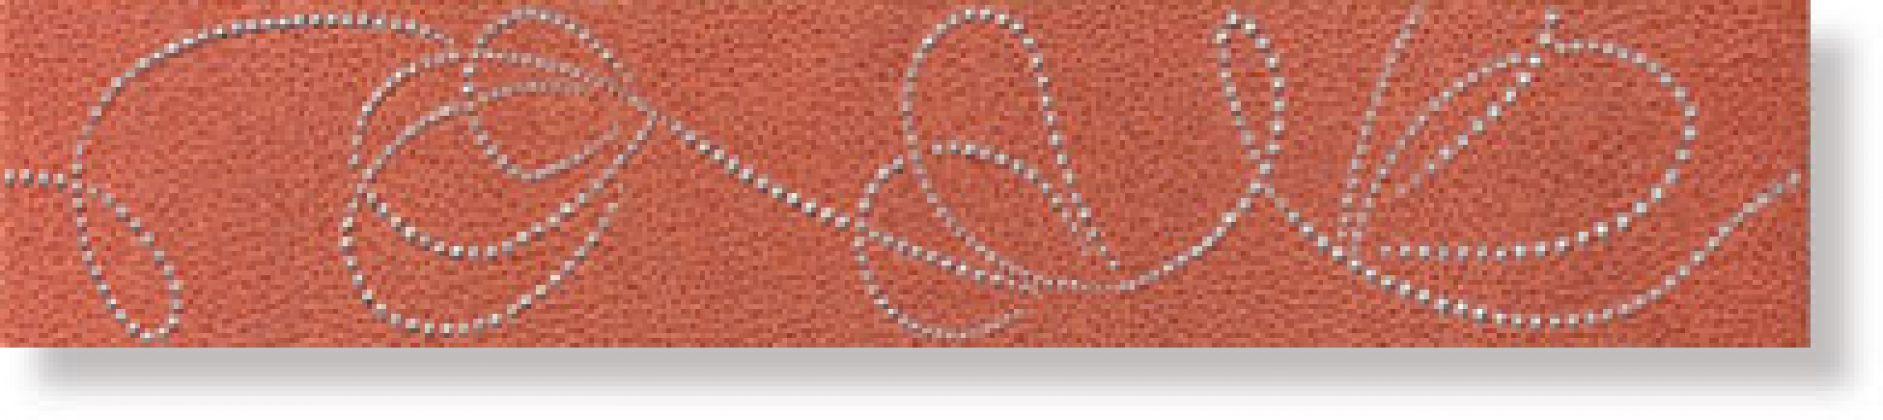 Бордюр В7155/7037 Фристайл Коричневый 9x50